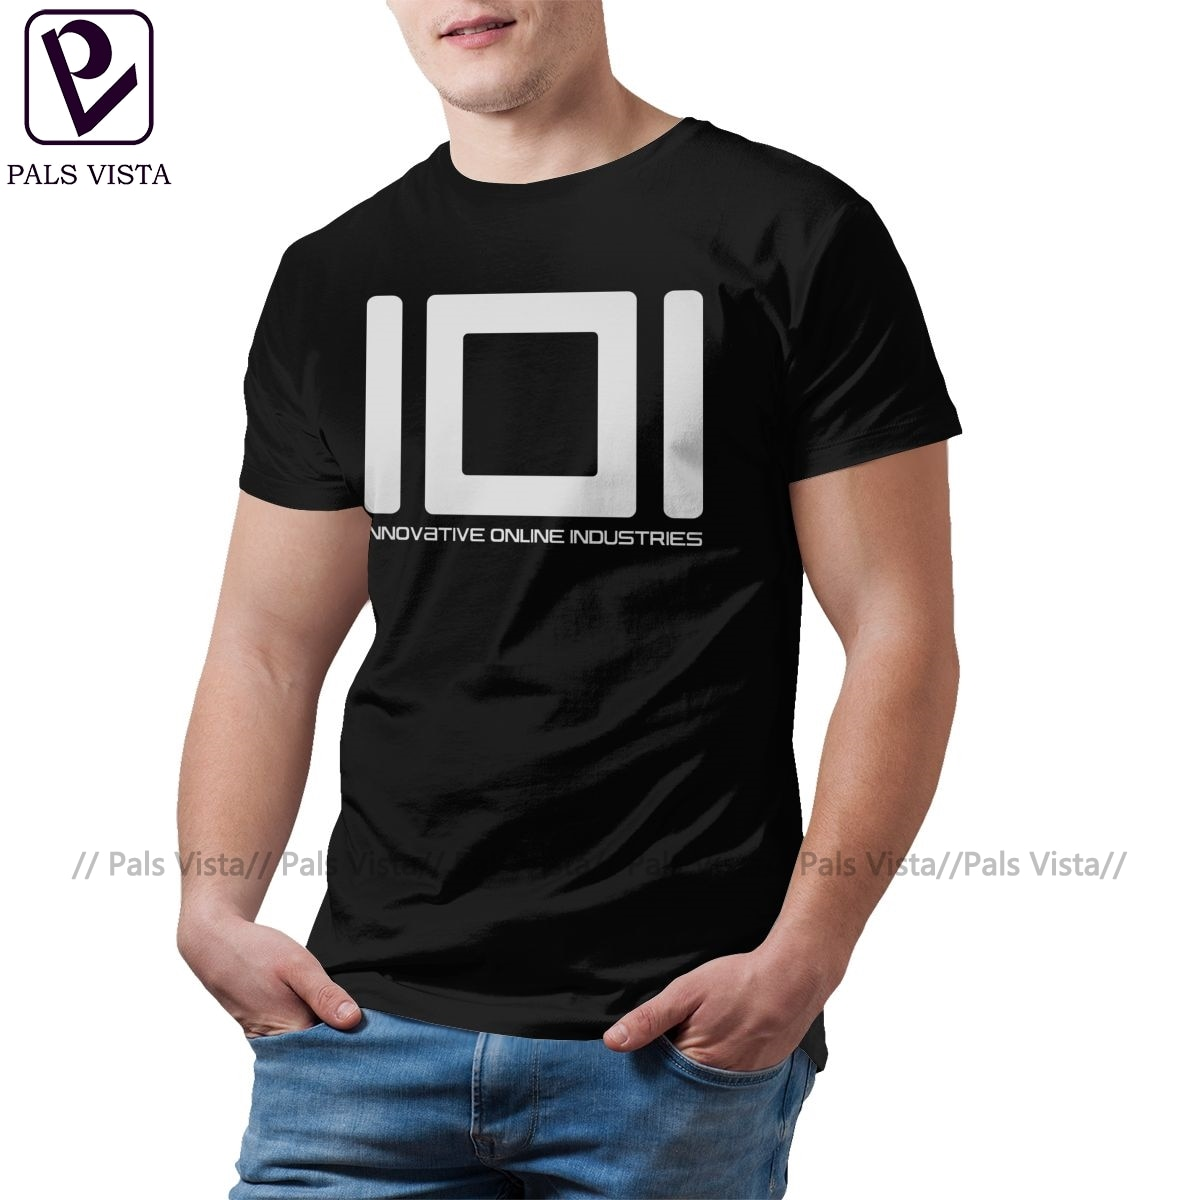 Ready Player One футболка инновационная Online Industries футболка Повседневная футболка с короткими рукавами футболка размера плюс